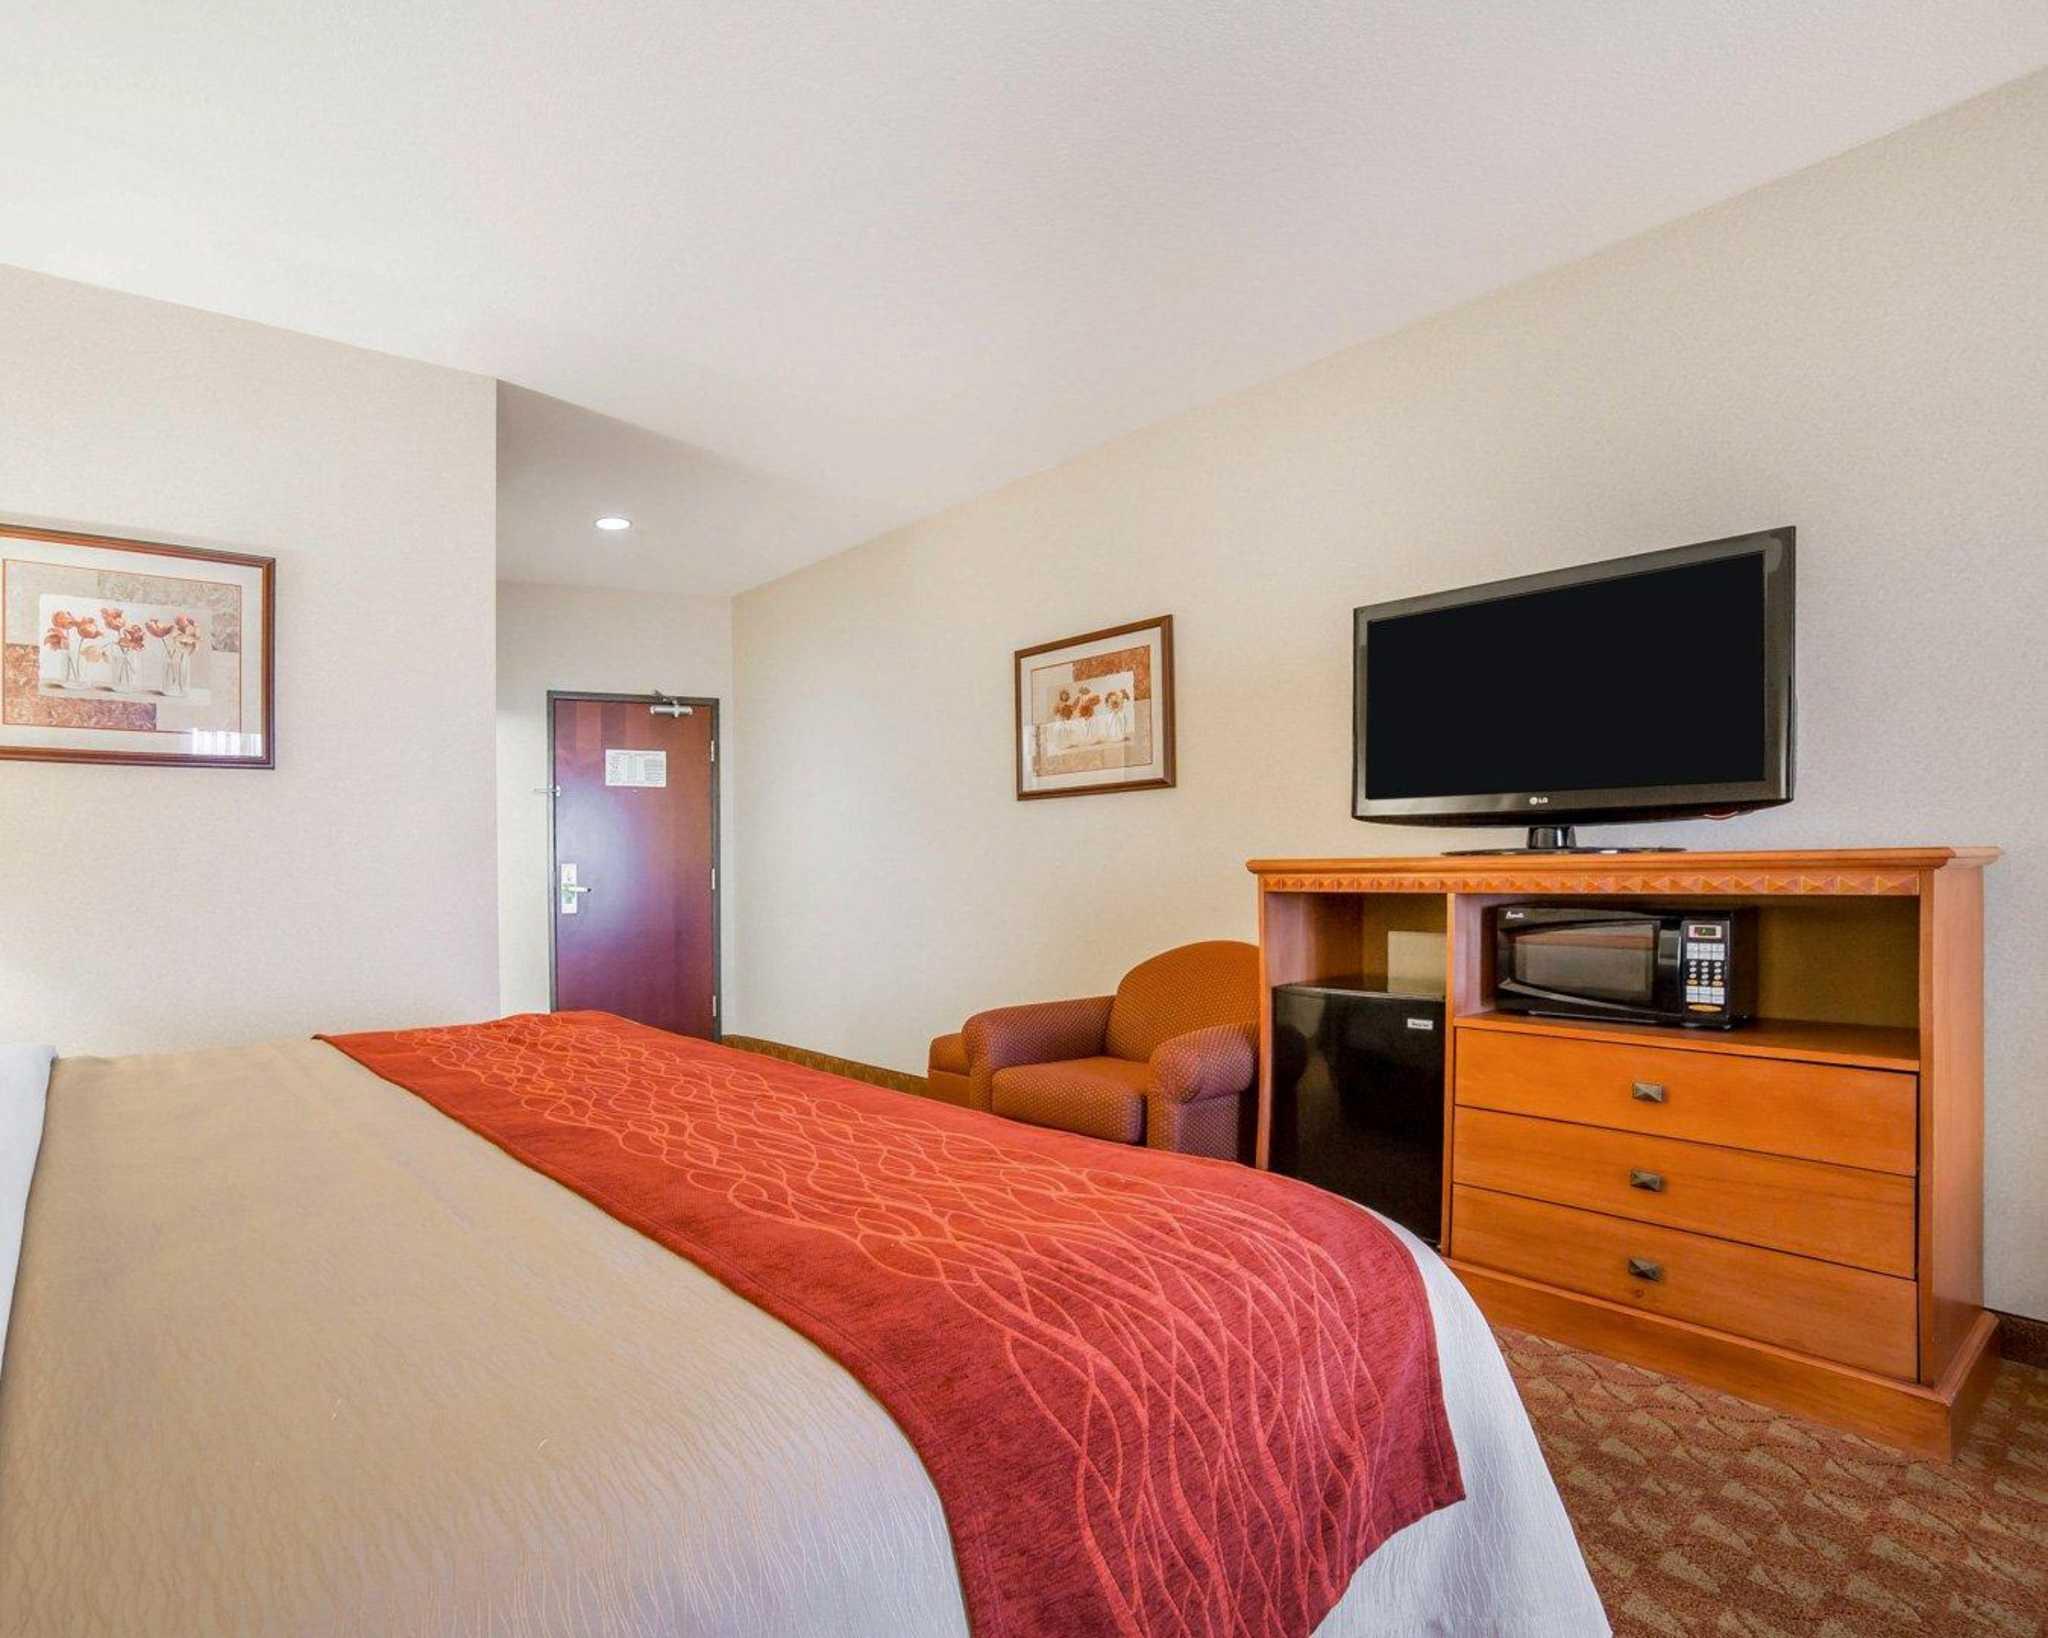 Comfort Inn & Suites Las Vegas - Nellis image 8